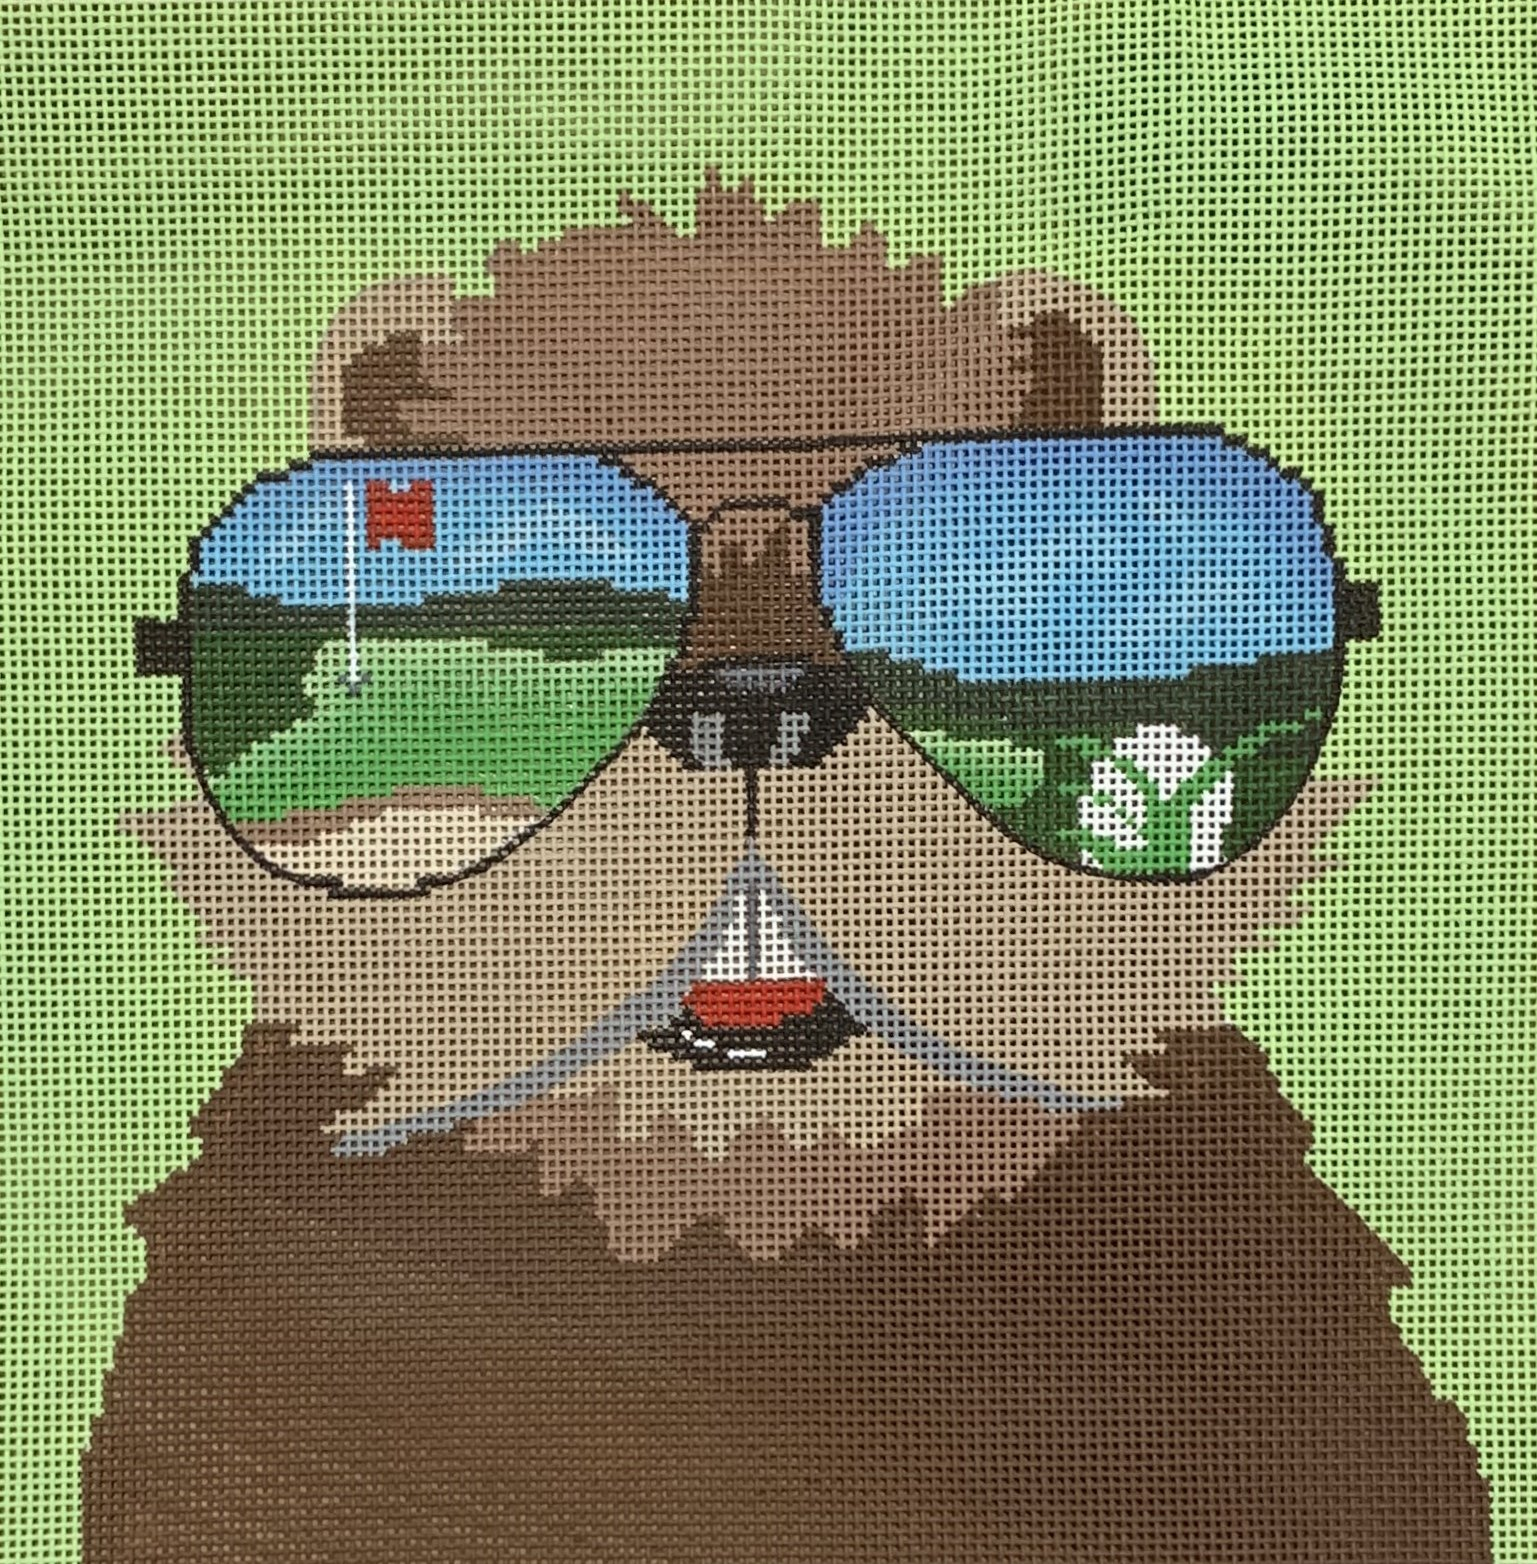 Sunglasses Gopher